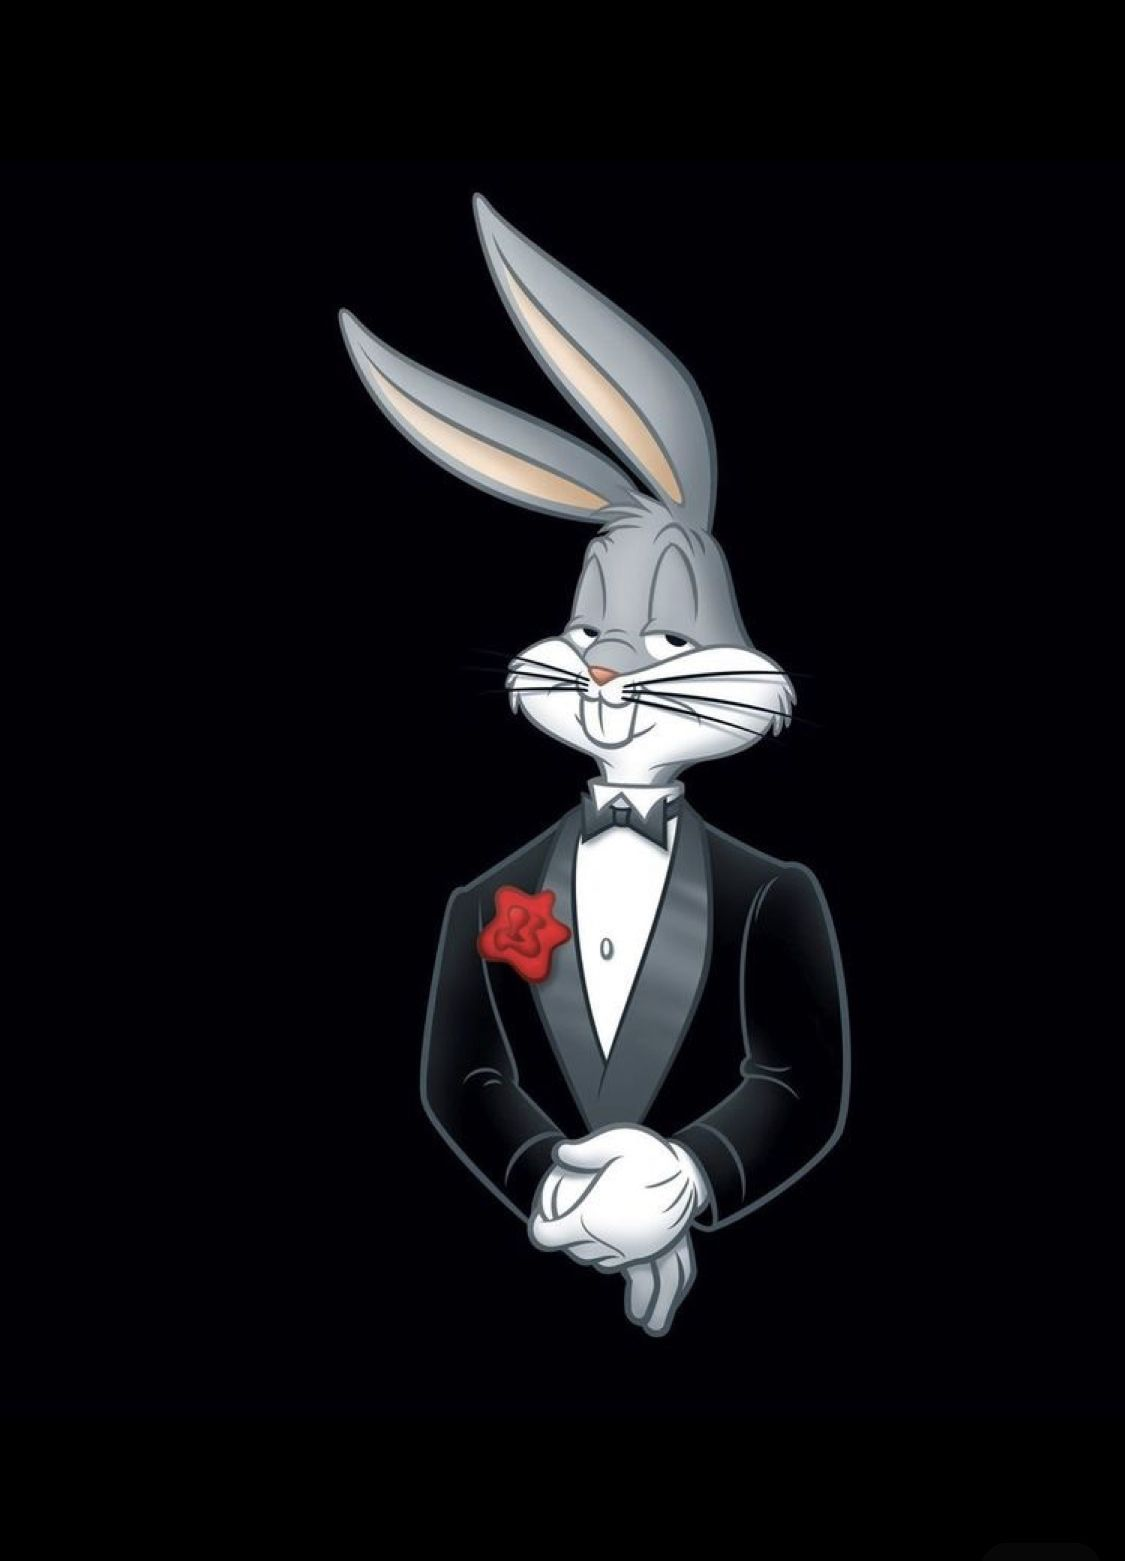 Bugs Bunny Cartoon Wallpaper Bunny Wallpaper Cute Wallpapers